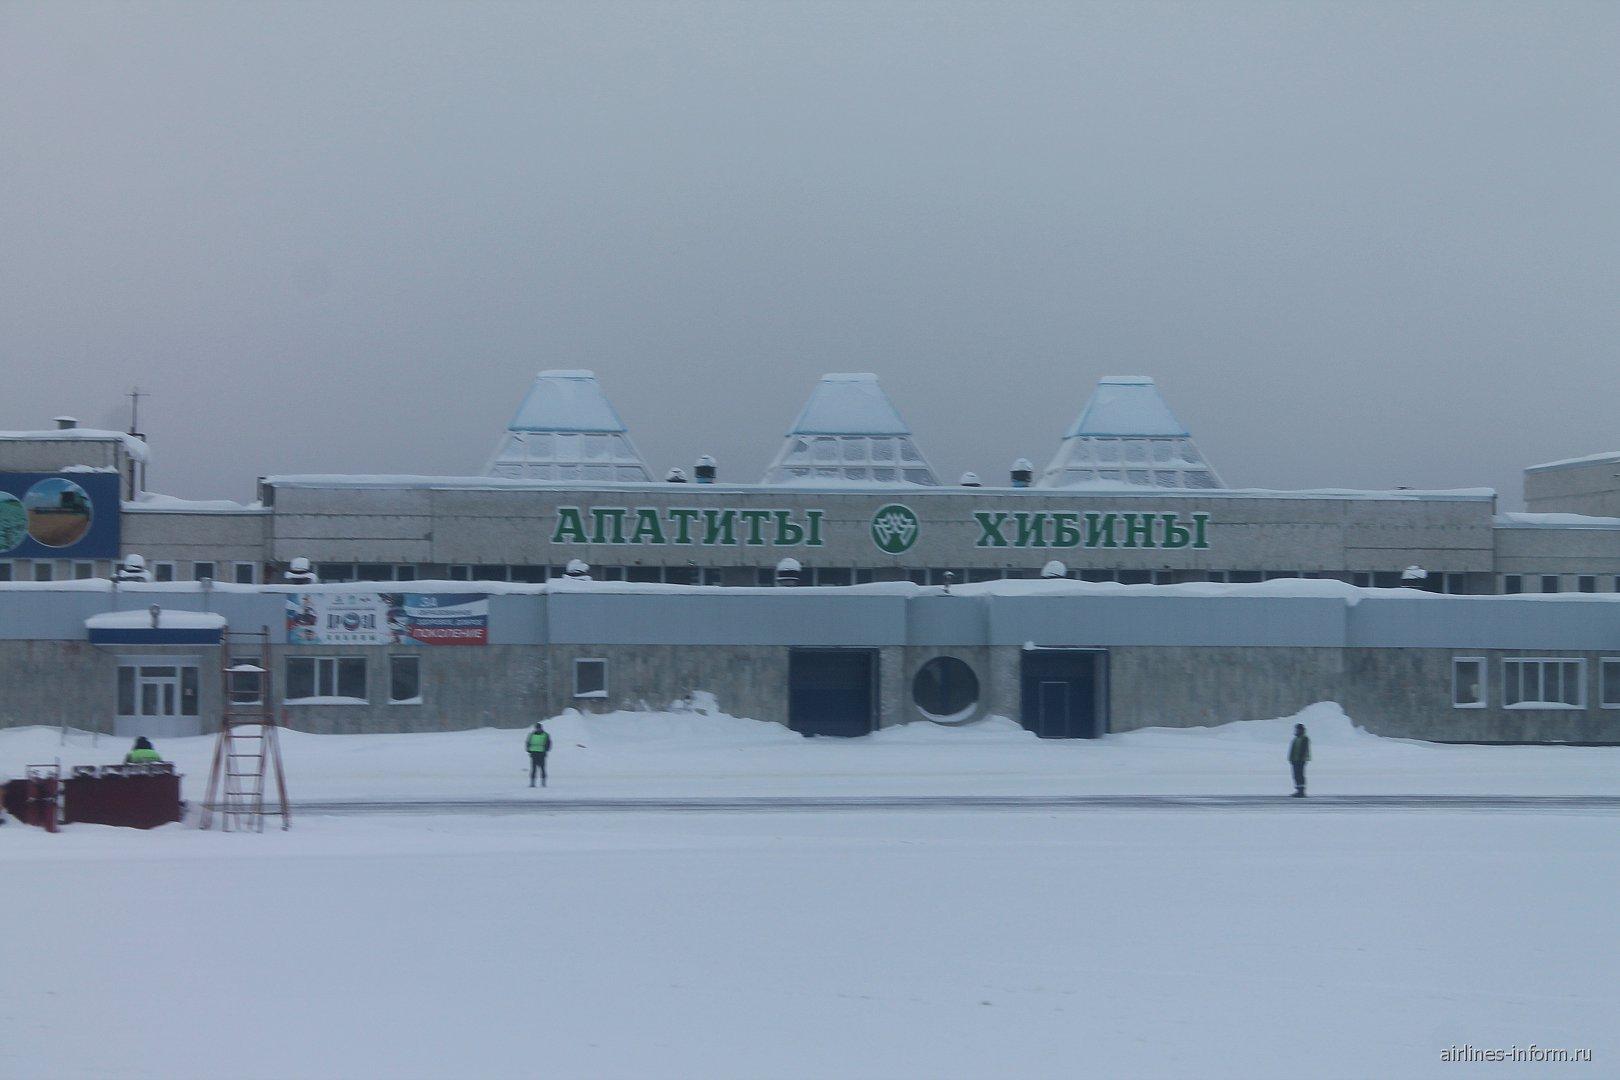 Аэровокзал аэропорта Апатиты Хибины